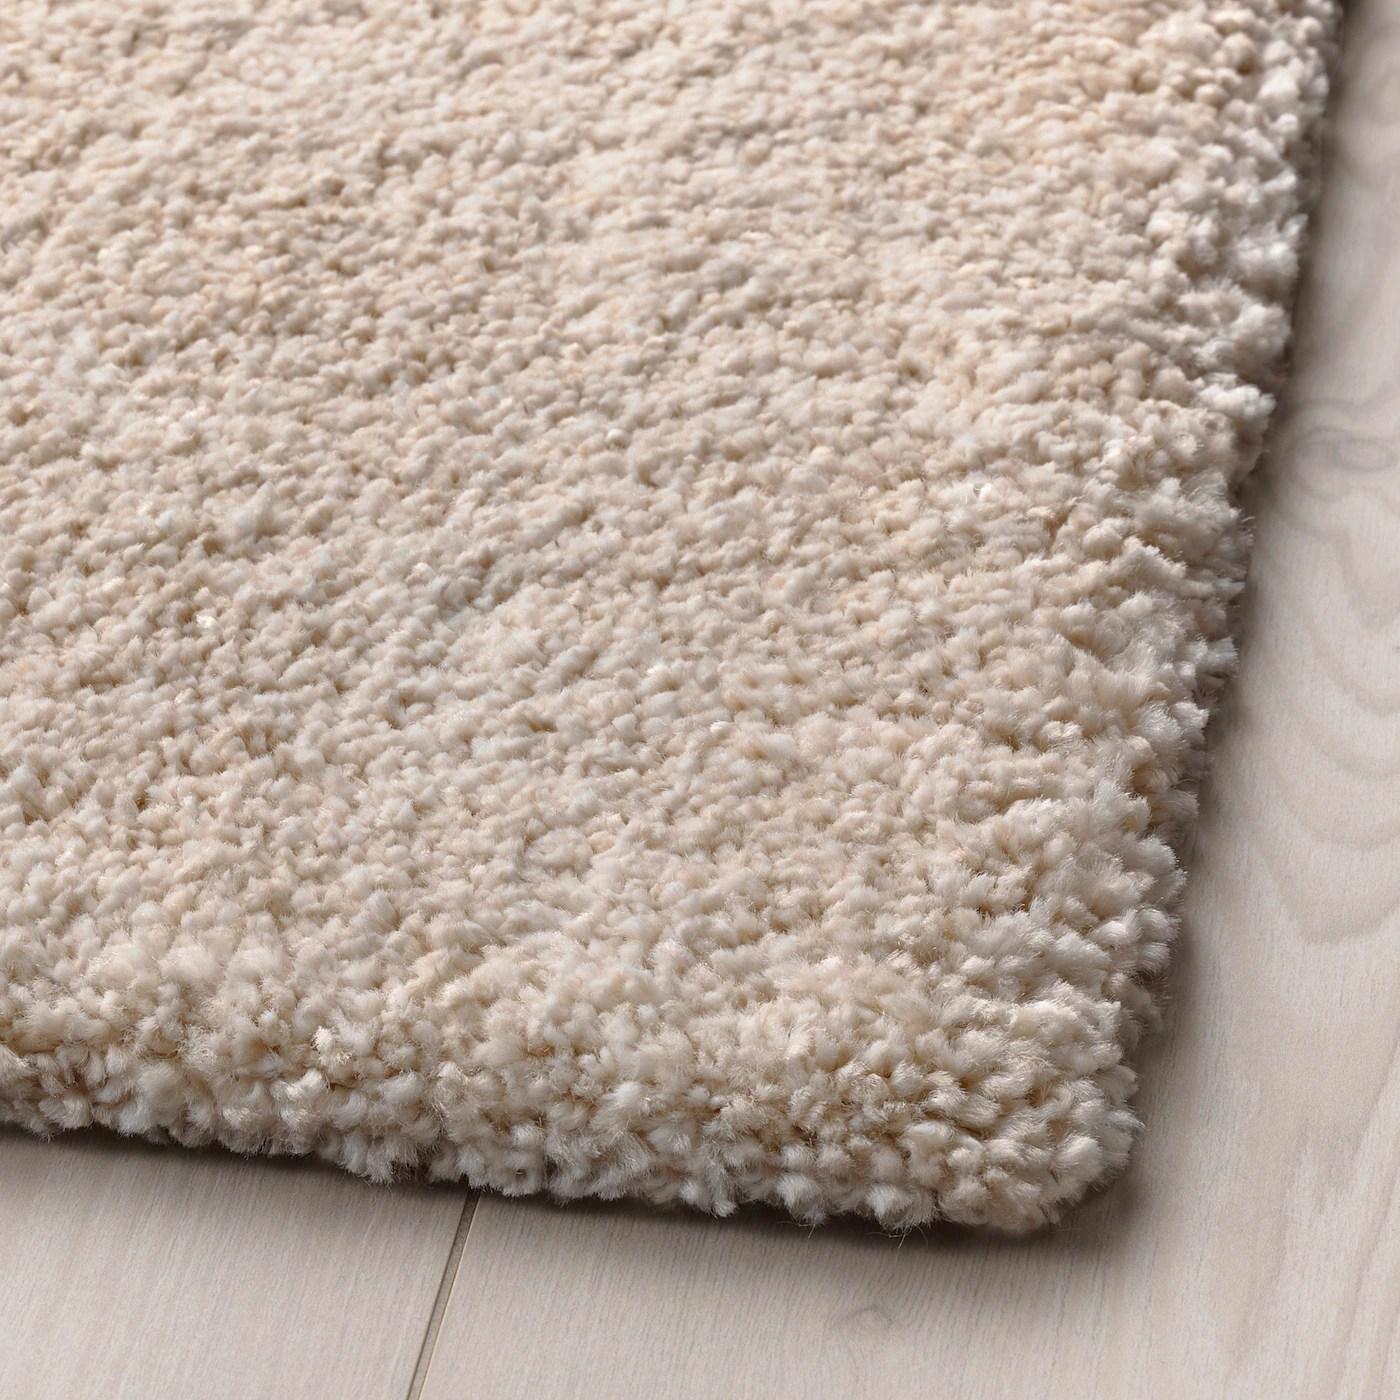 stoense tapis poils ras blanc casse 200x300 cm